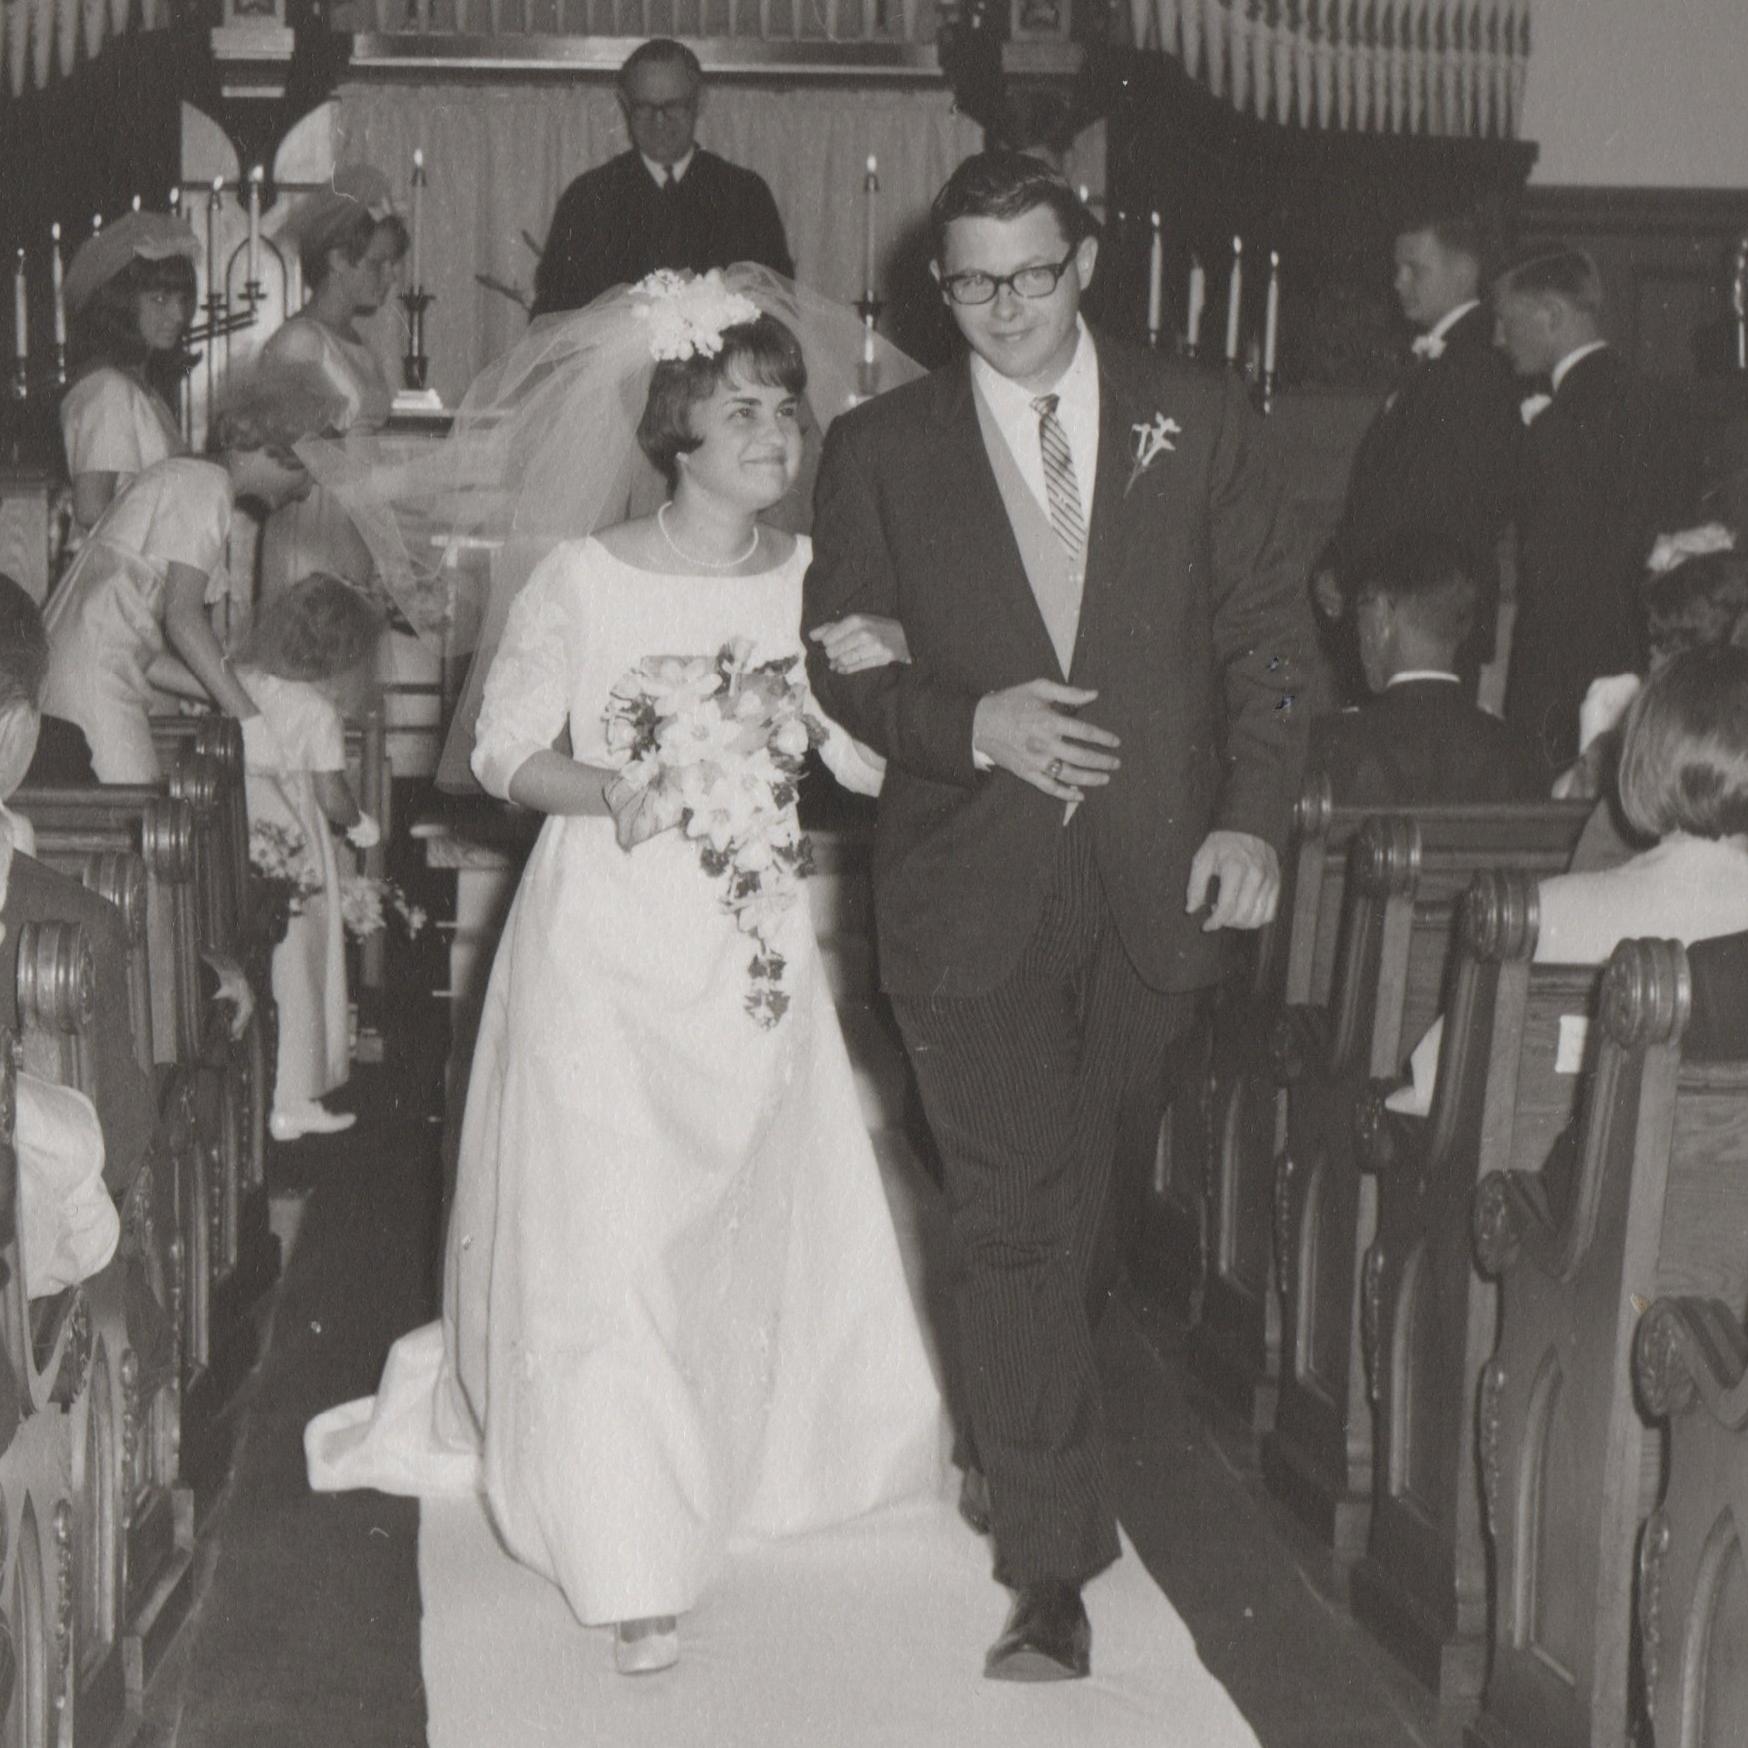 Tom and Sue Rice Wedding Photo.jpeg